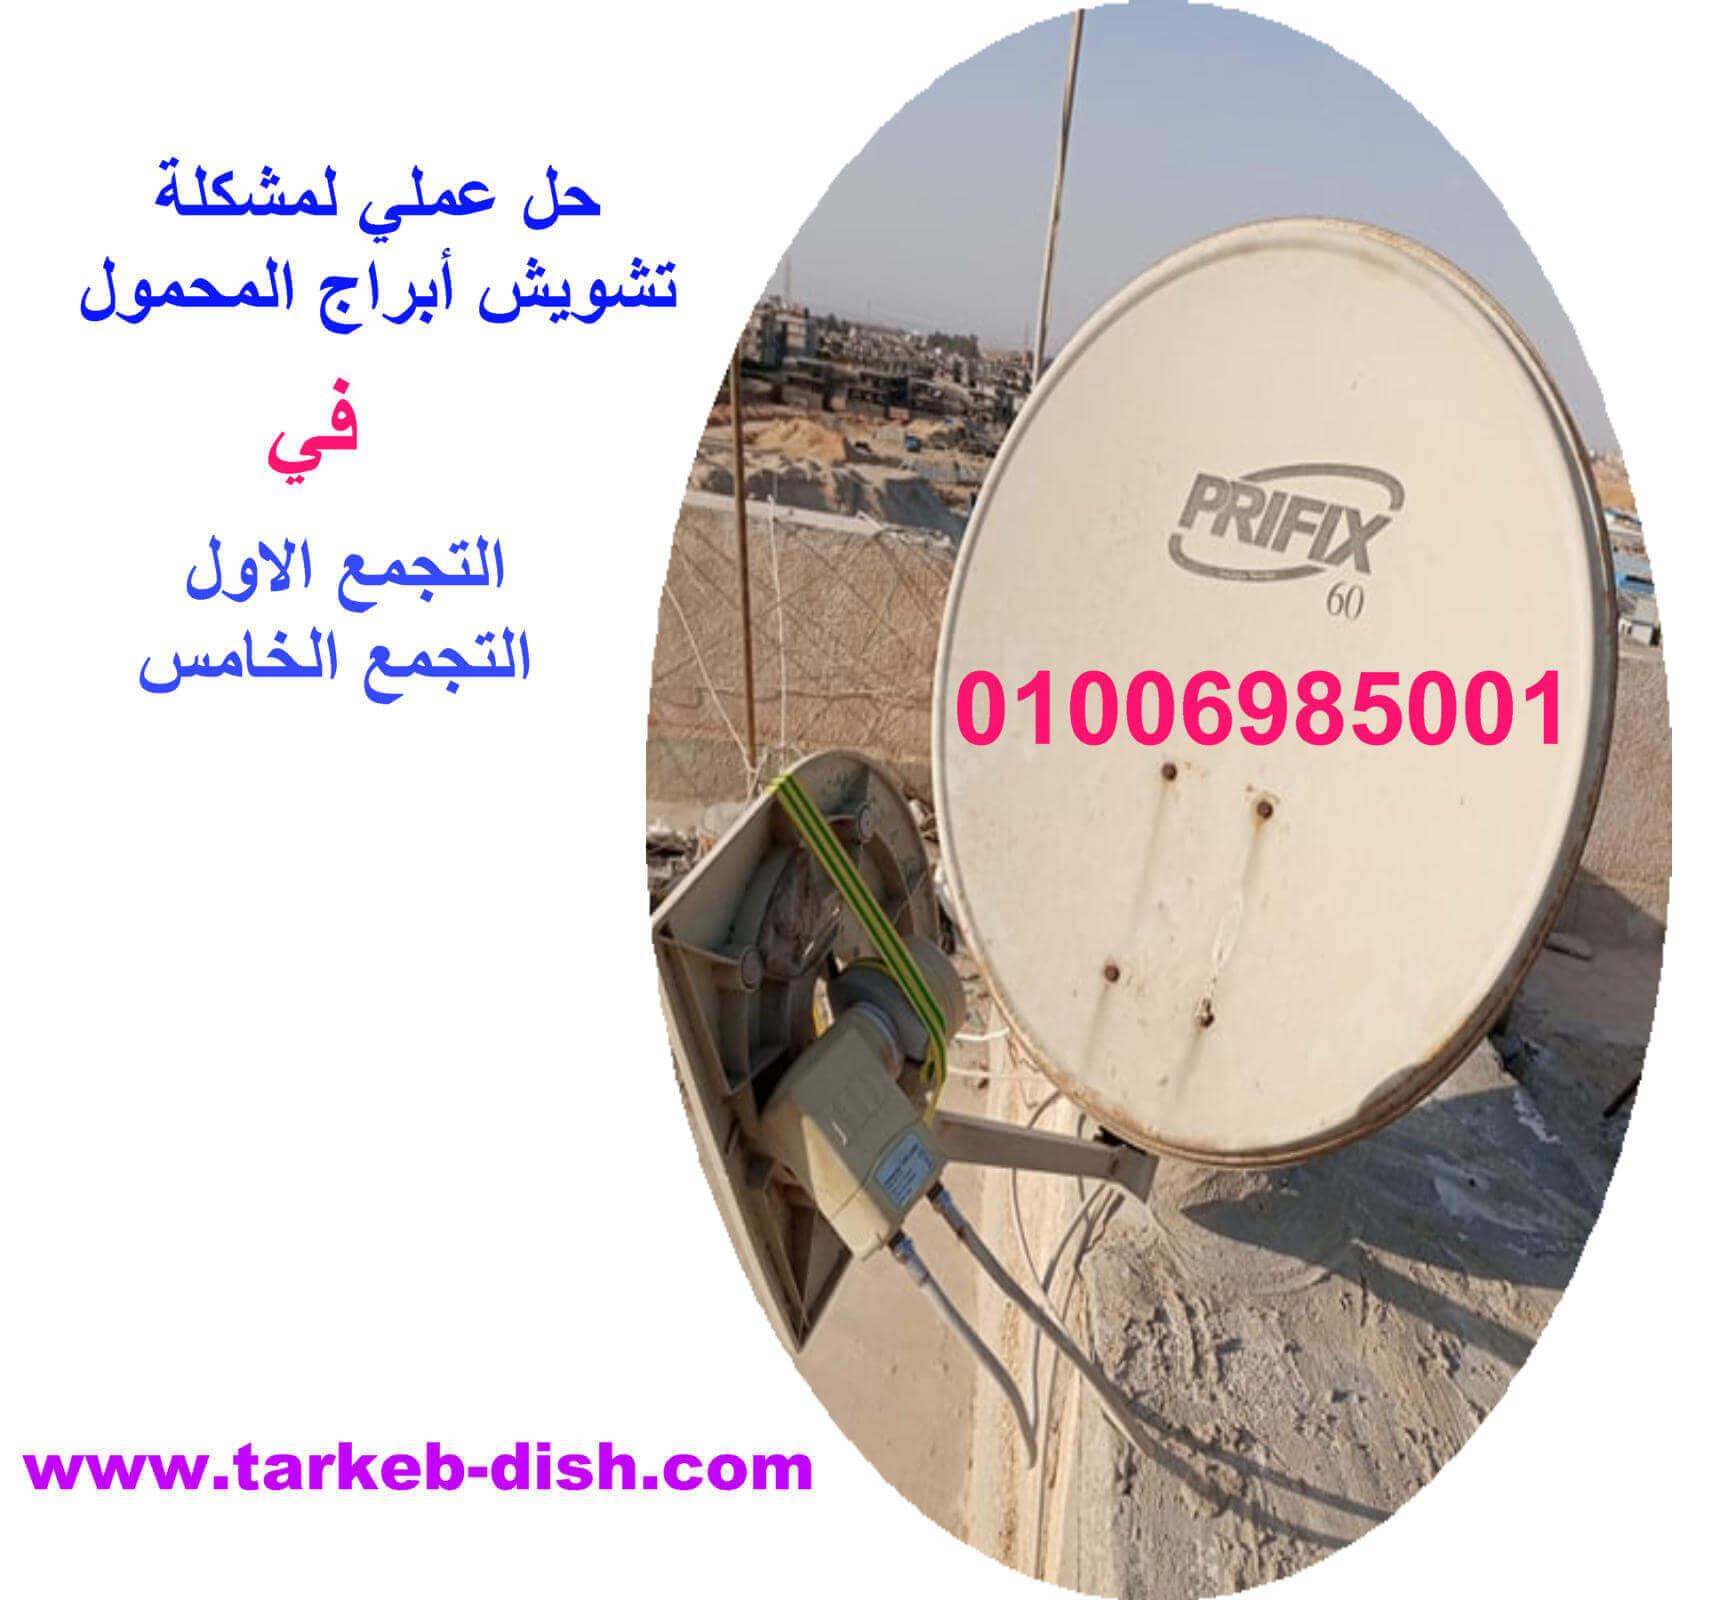 Photo of منع تشويش شبكات المحمول علي الدش